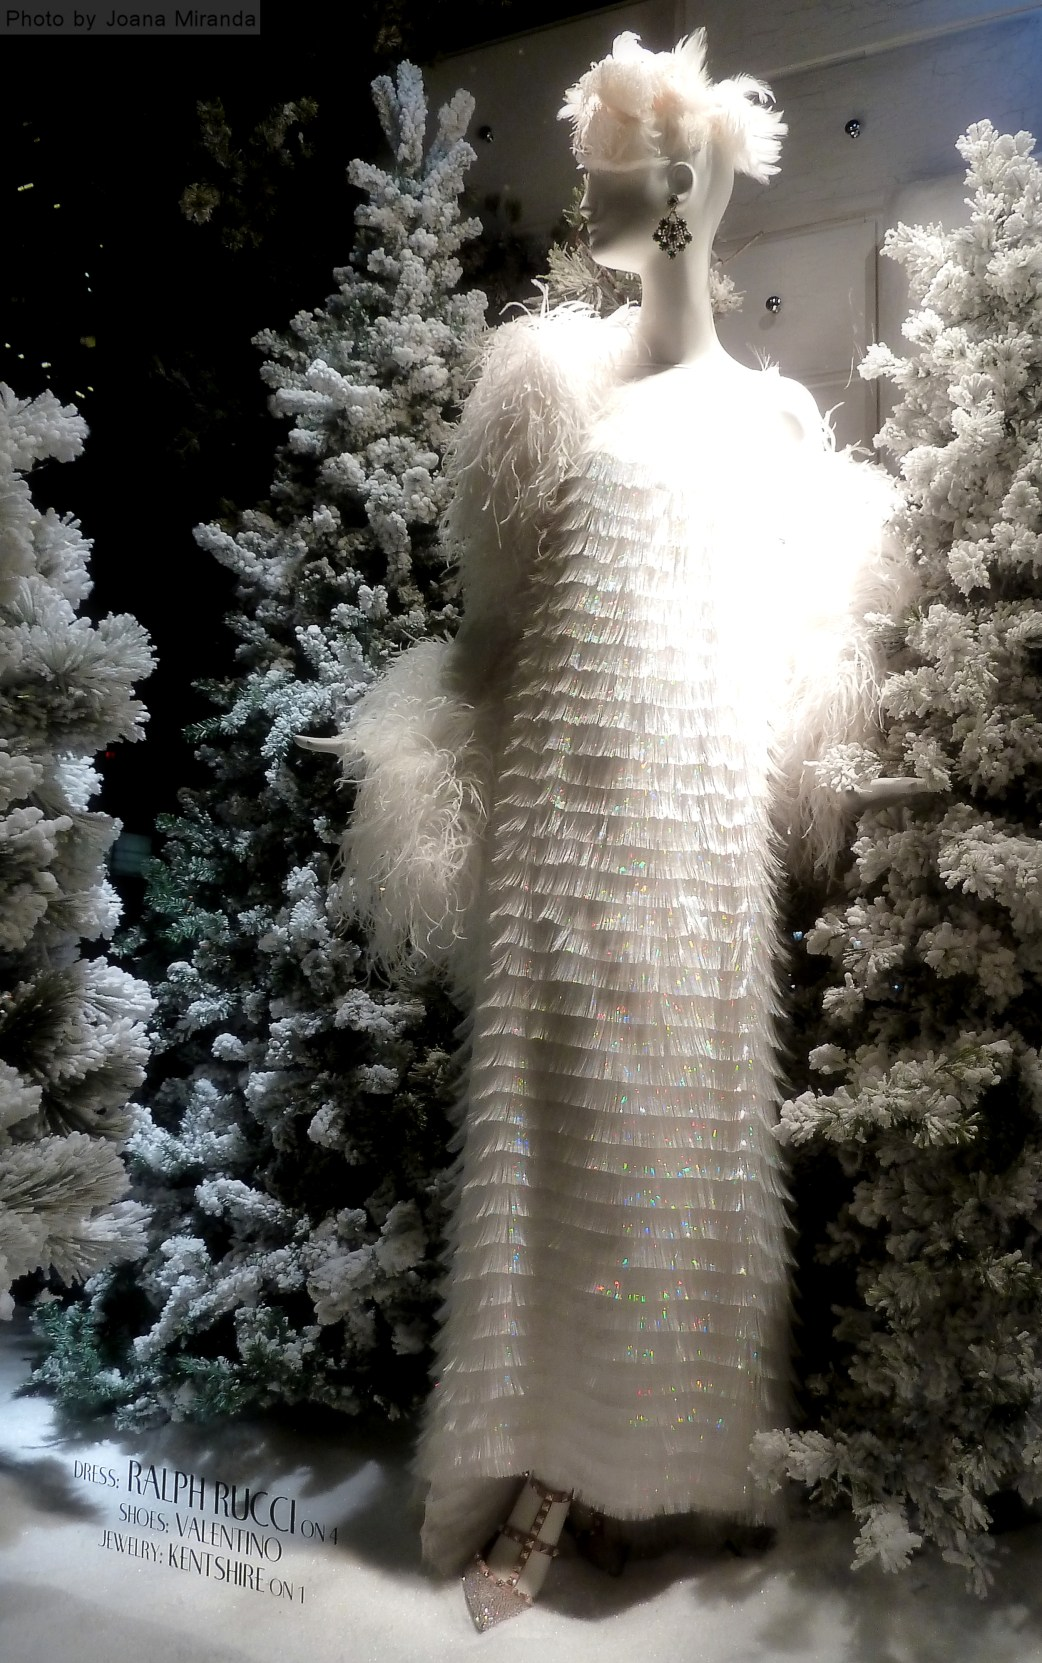 Photo of mannequin dressed in white fringe dress in Bergdorf Goodman's 2013 Christmas window display, taken by Joana Miranda